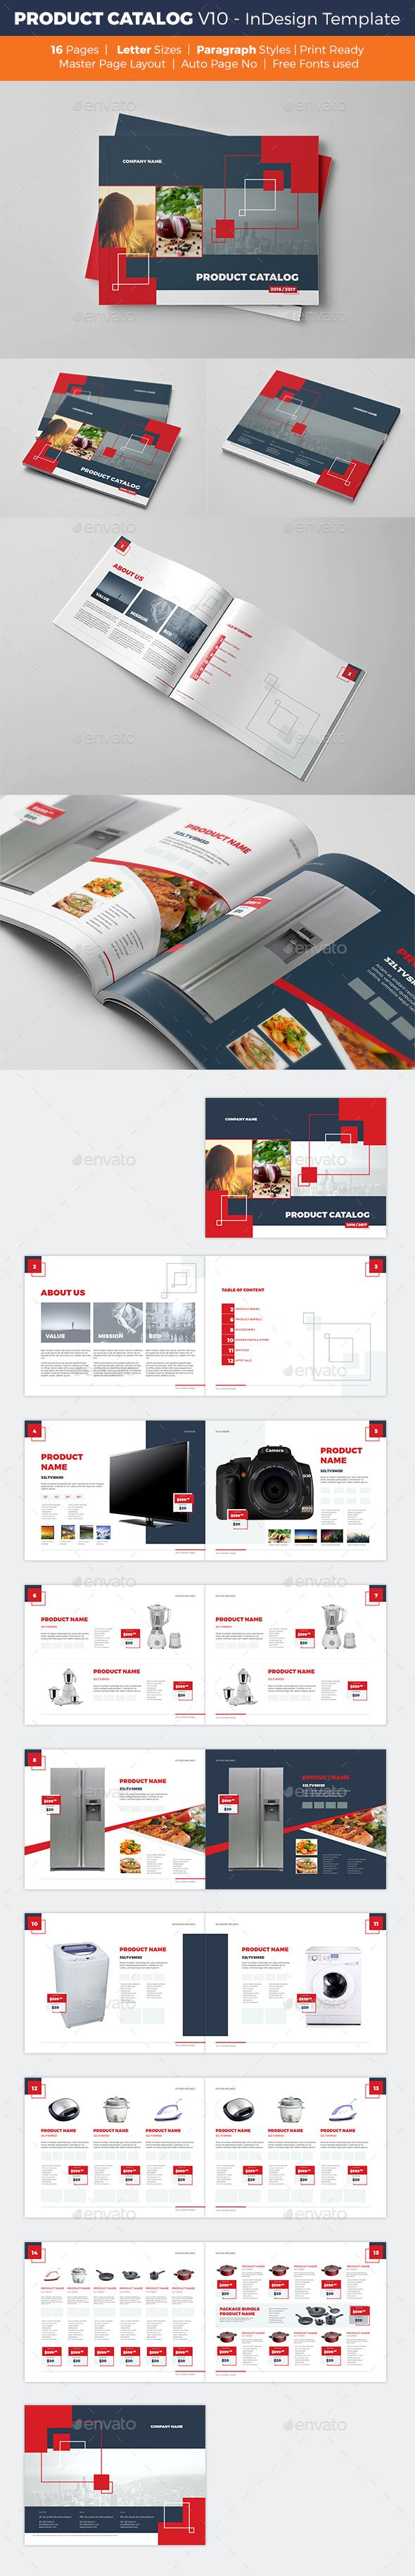 16 best InDesign Catalog Templates images on Pinterest | Brochure ...